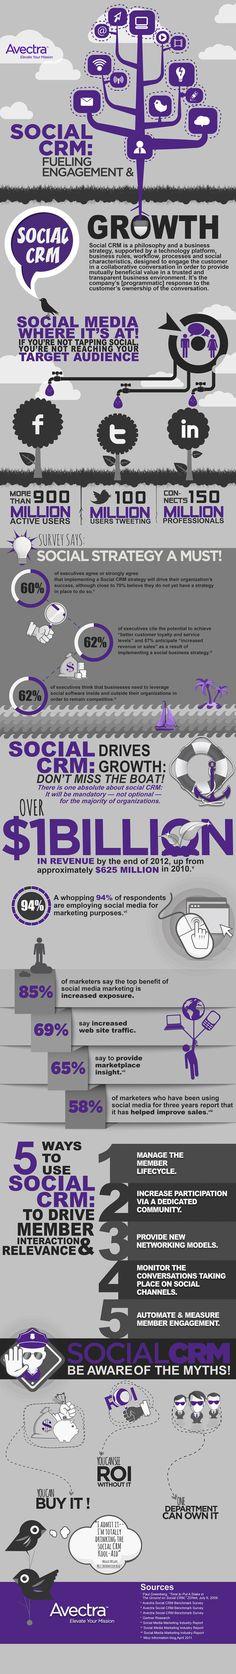 Social CRM Fuels Engagement and Growth. #socialmedia